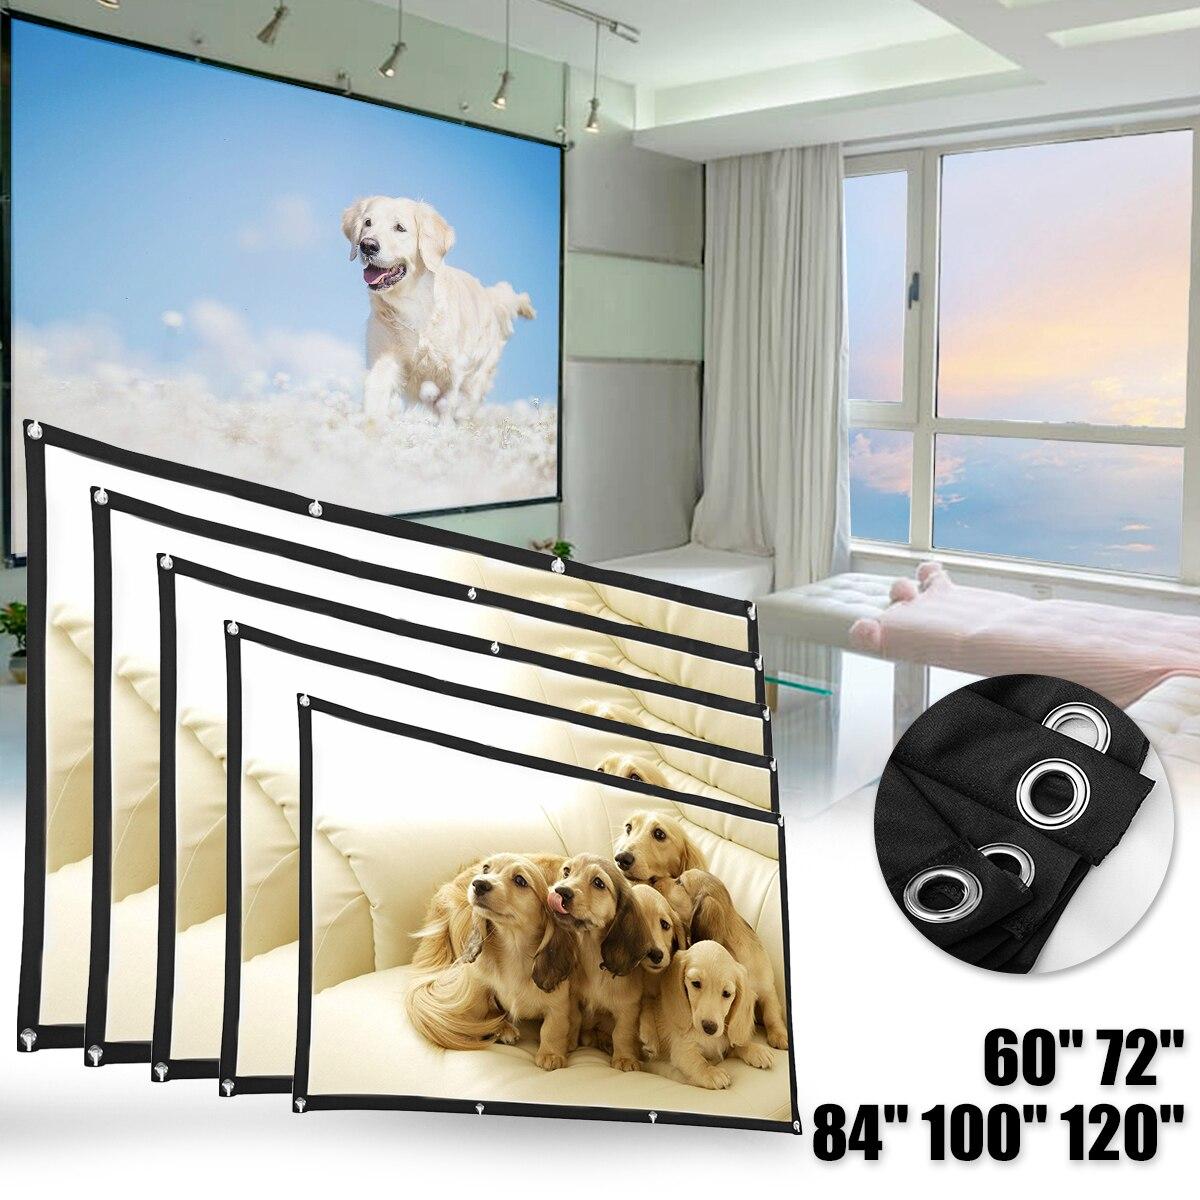 60 72 84 100 120 zoll 16:9 Tragbare Projektor Bildschirm Projektion HD Home Cinema Theater Faltbare Bildschirm Leinwand für Projektor